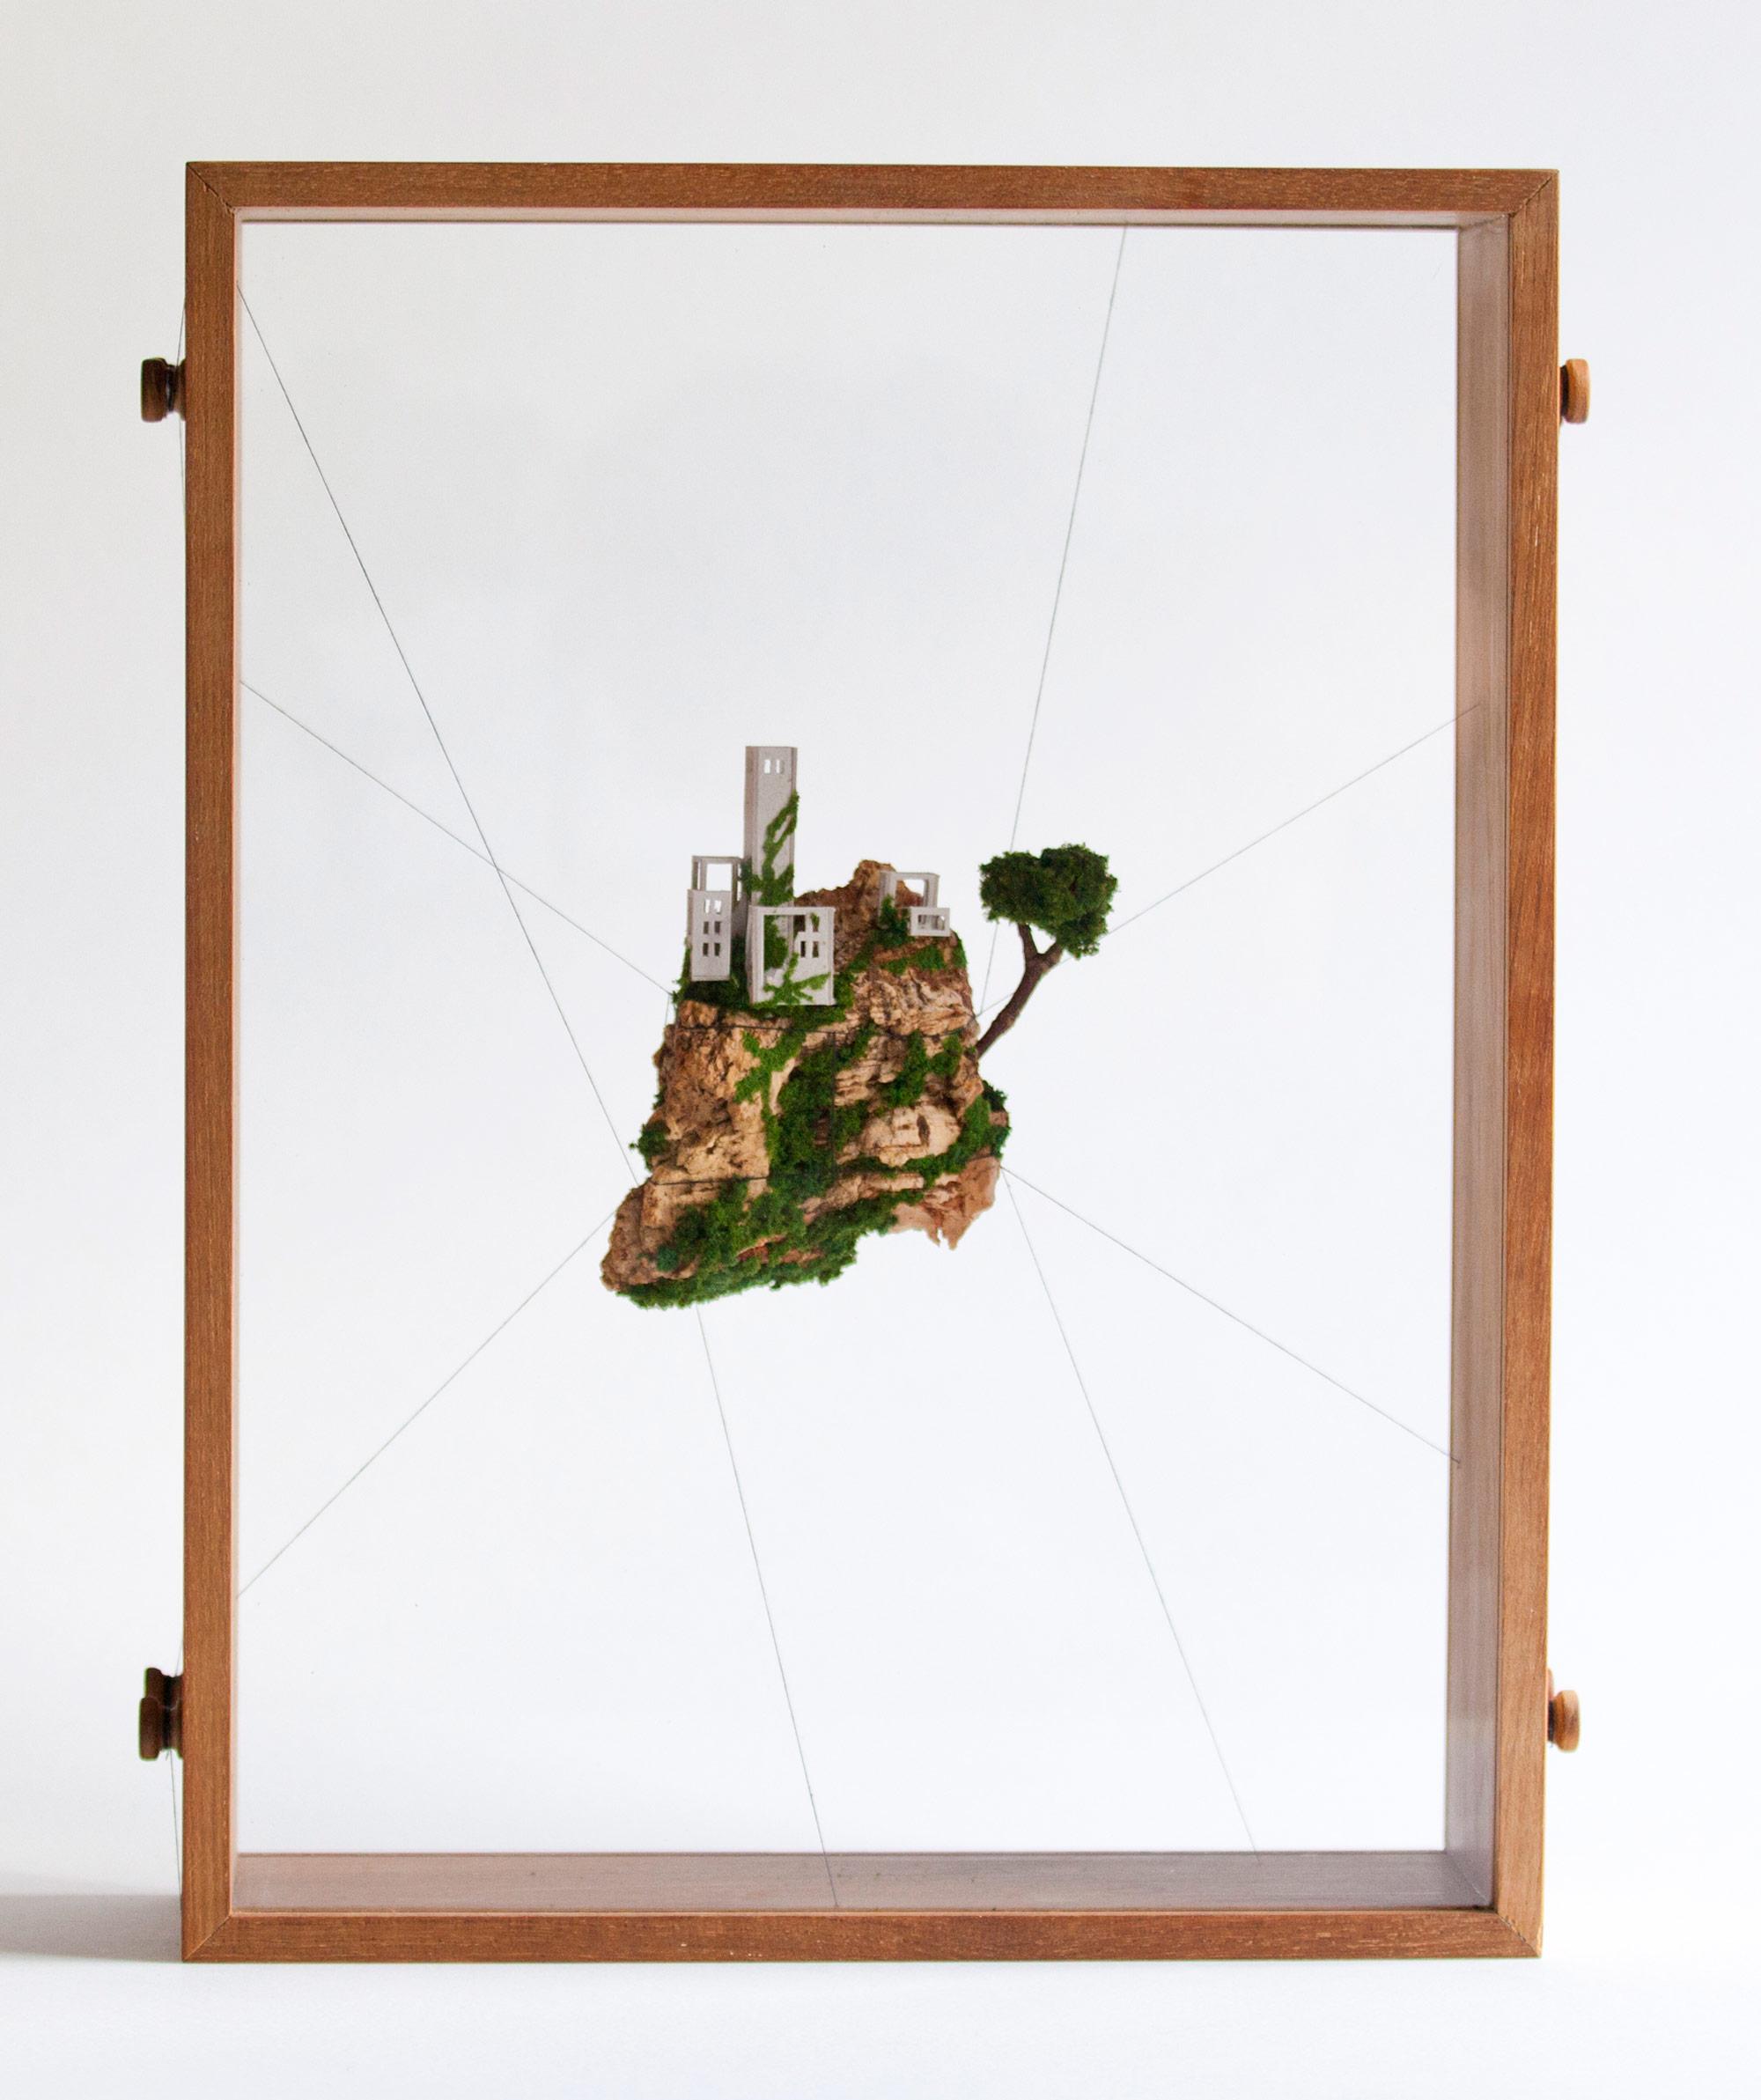 Miniature Houses on Cork Cliffs Float Inside Handmade Wooden Frames ...